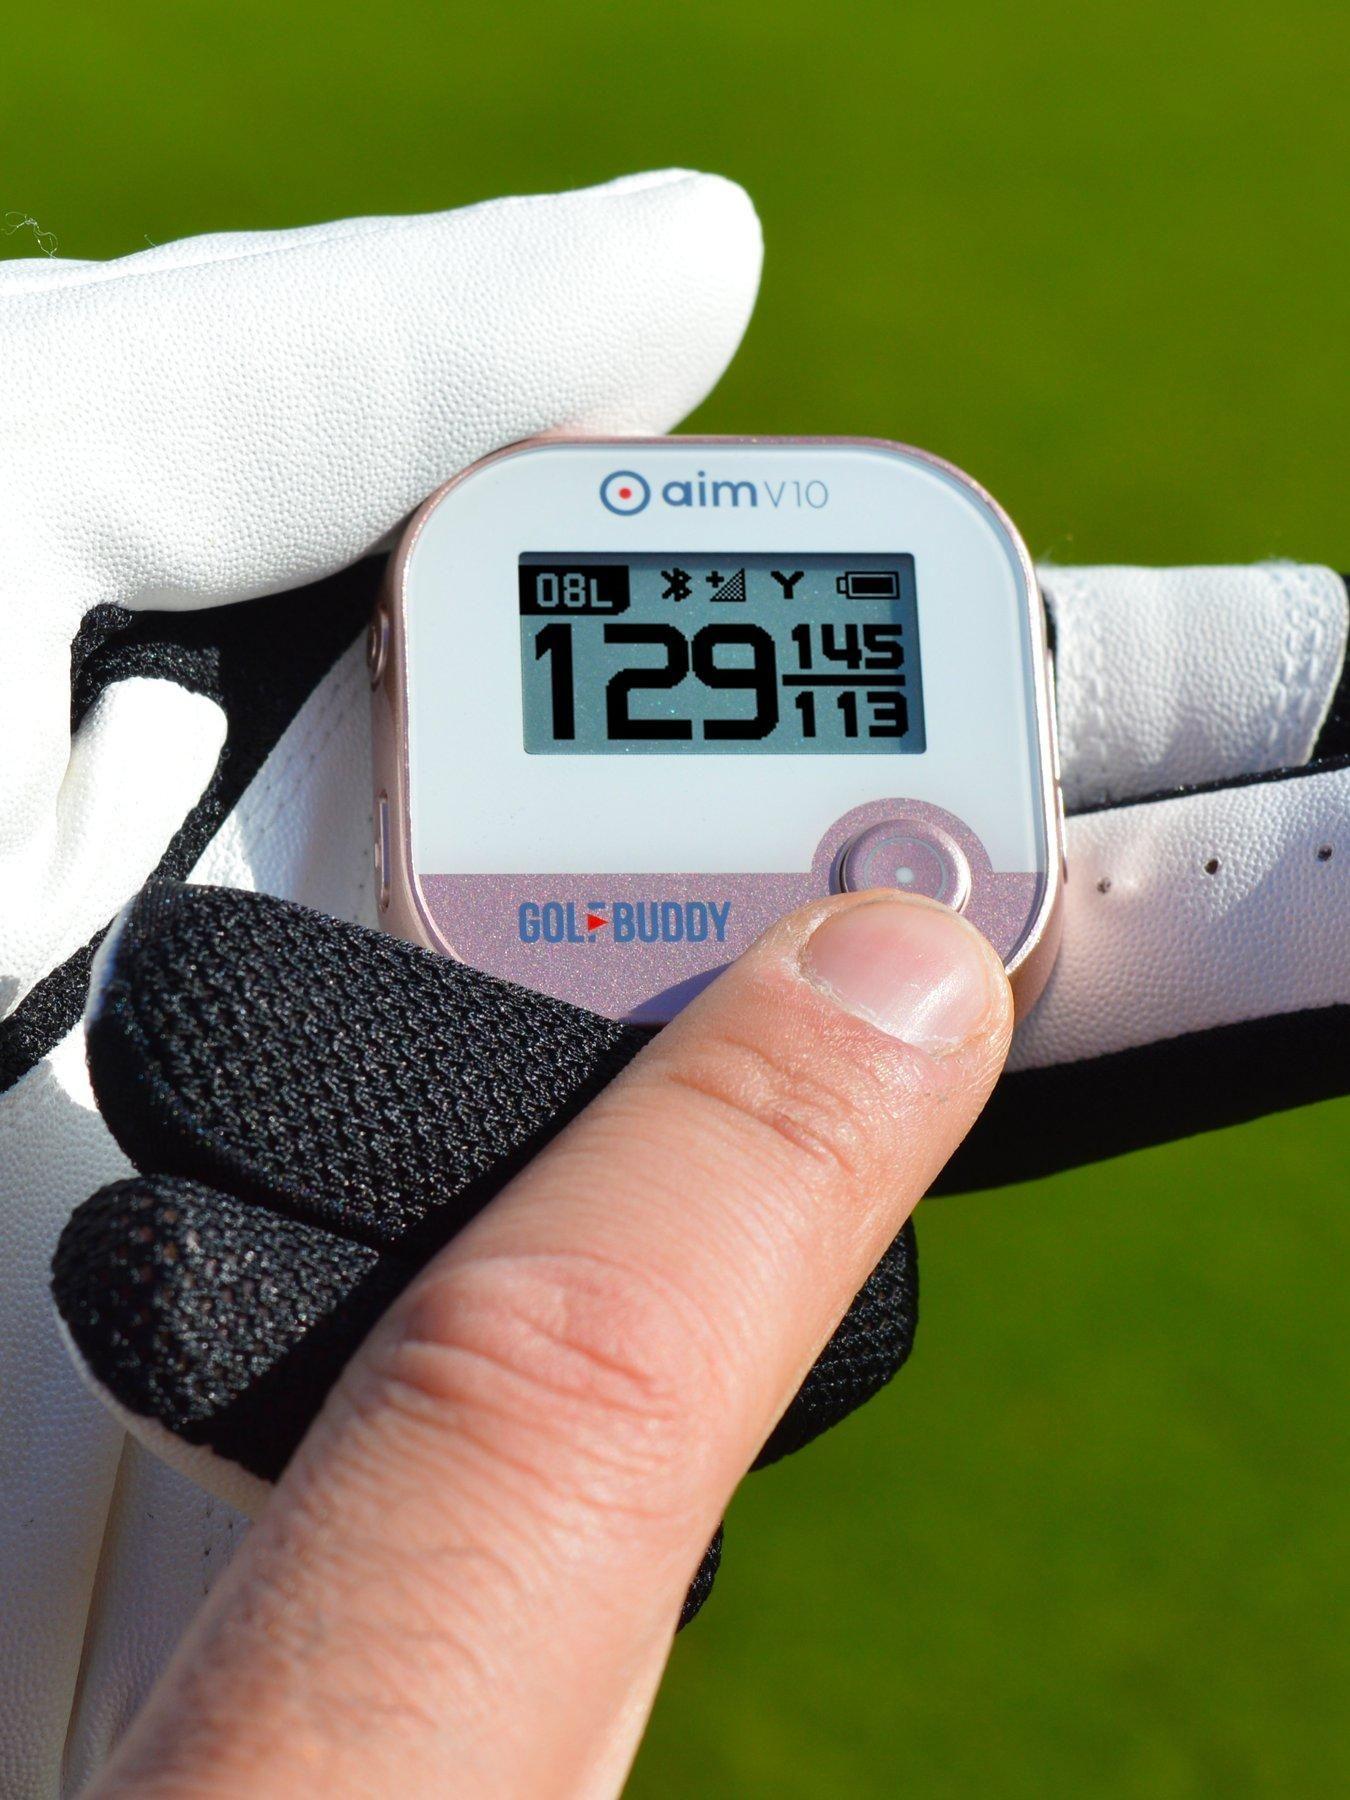 Golf Buddy aim V10 Talking Golf GPS Yardage System with Bluetooth Technology #bluetoothtechnology